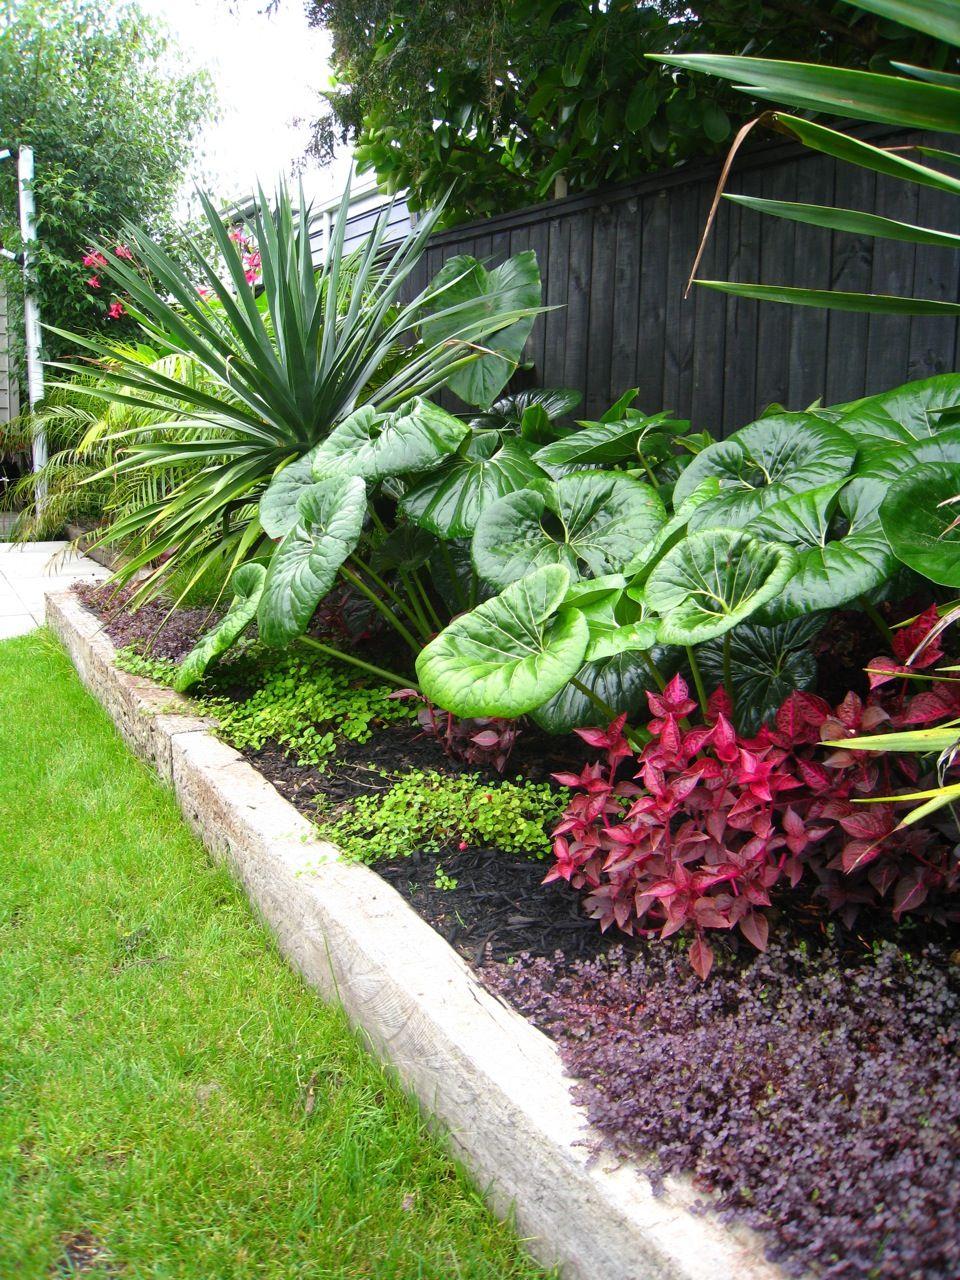 Greenart Garden Design And Landscaping Ltd Inspirational Garden Design Auckland Landscape De Small Garden Landscape Tropical Landscaping Small Tropical Gardens